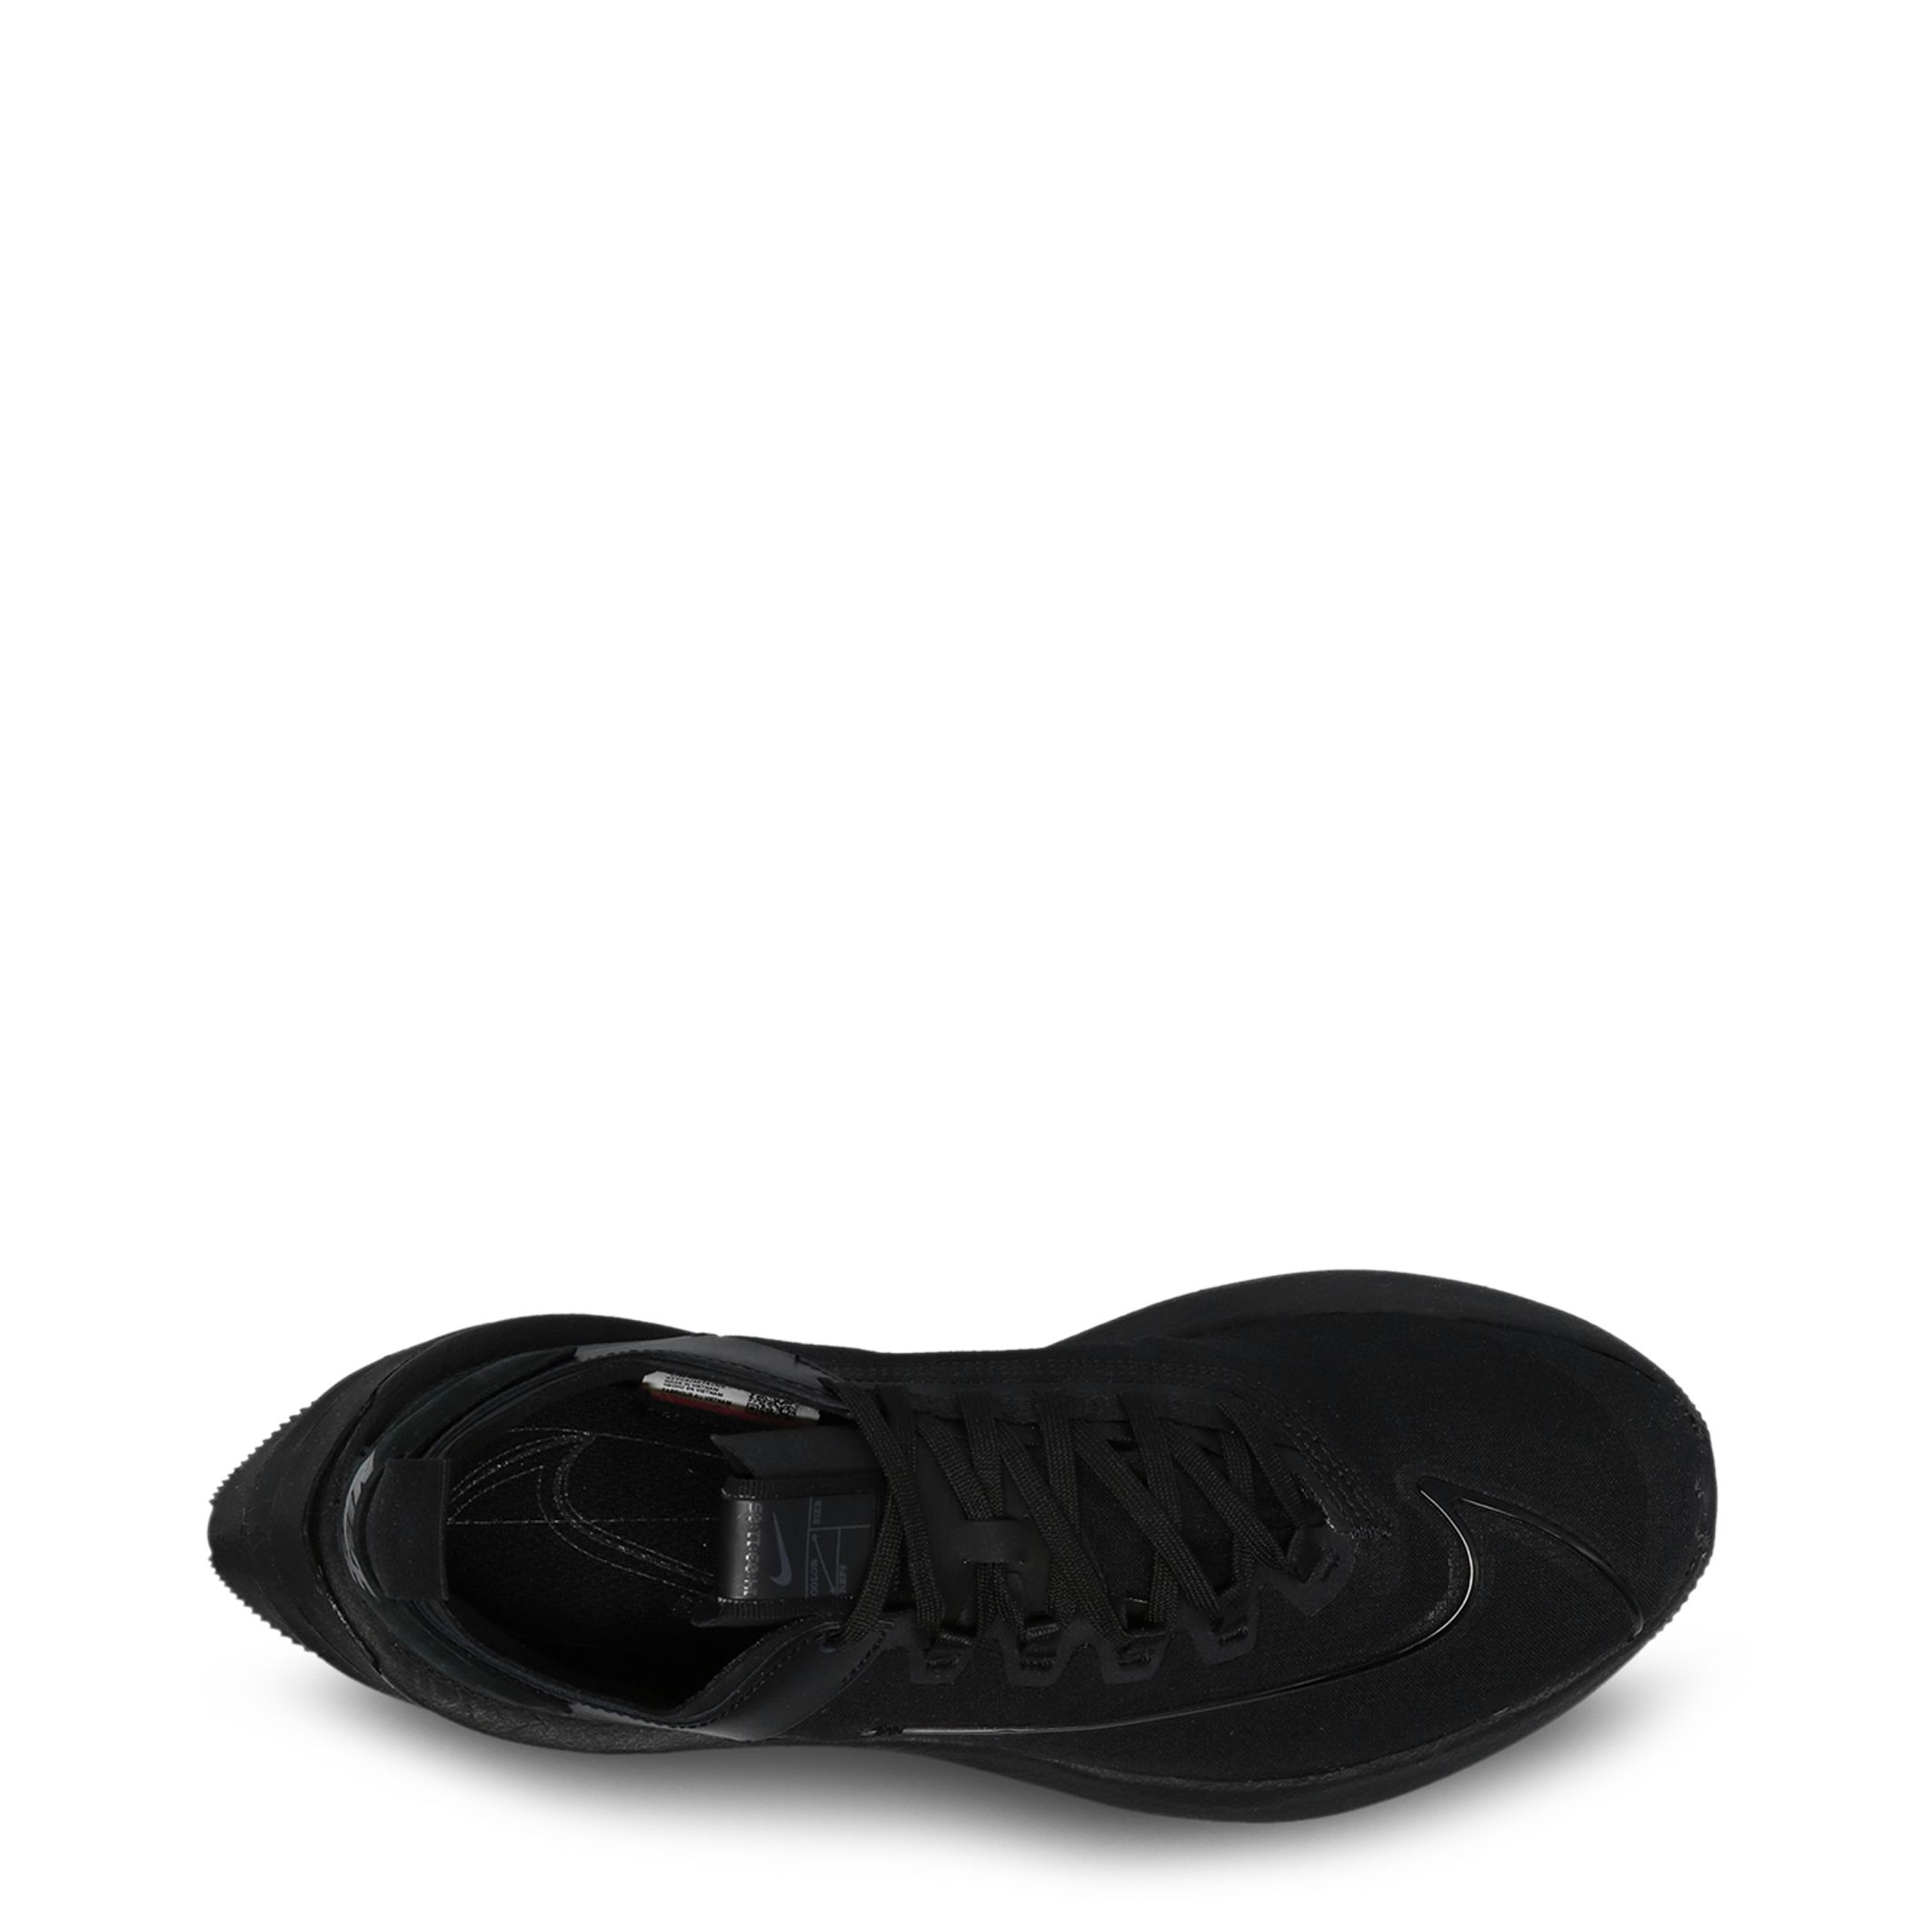 F00A3040 6D21 11Eb 8C4F C5B33833D7F6 Nike - W-Zoomdoublestacked - Black